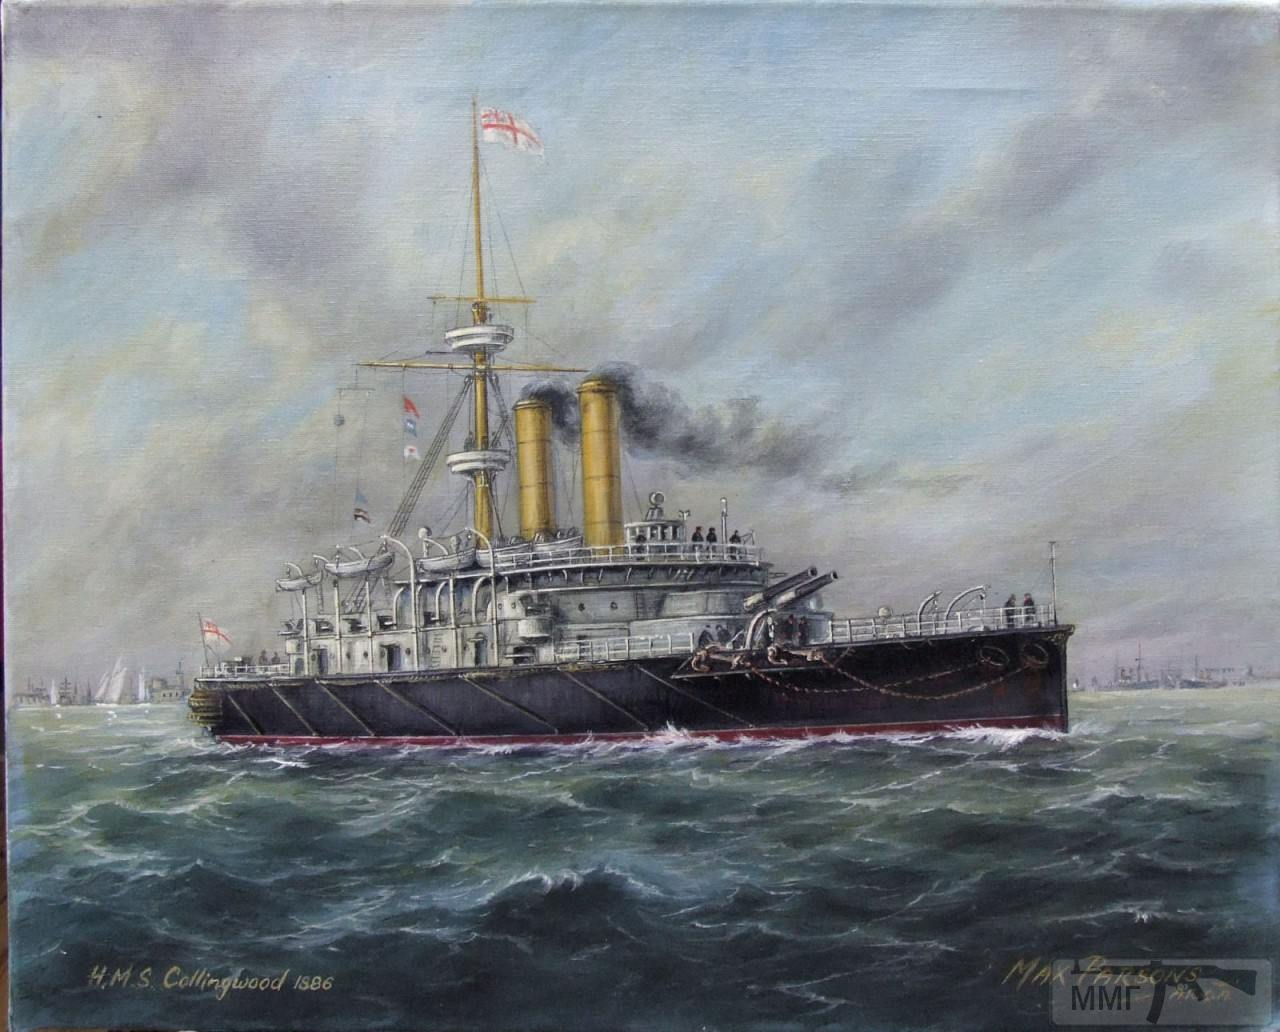 36183 - HMS Collingwood